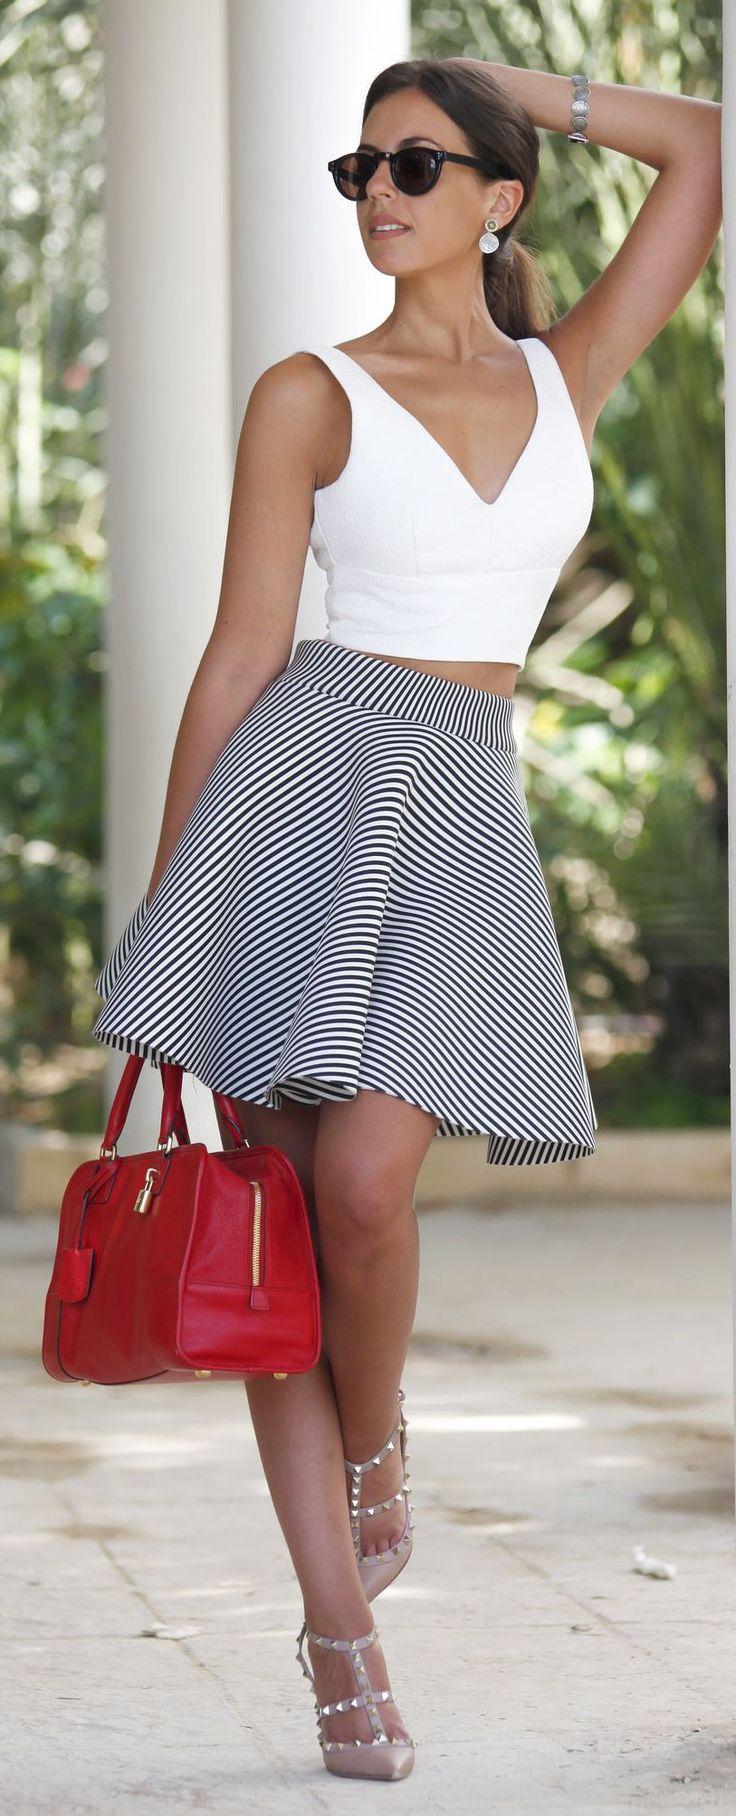 Striped Ballerina Skirt by 1sillaparamibolso